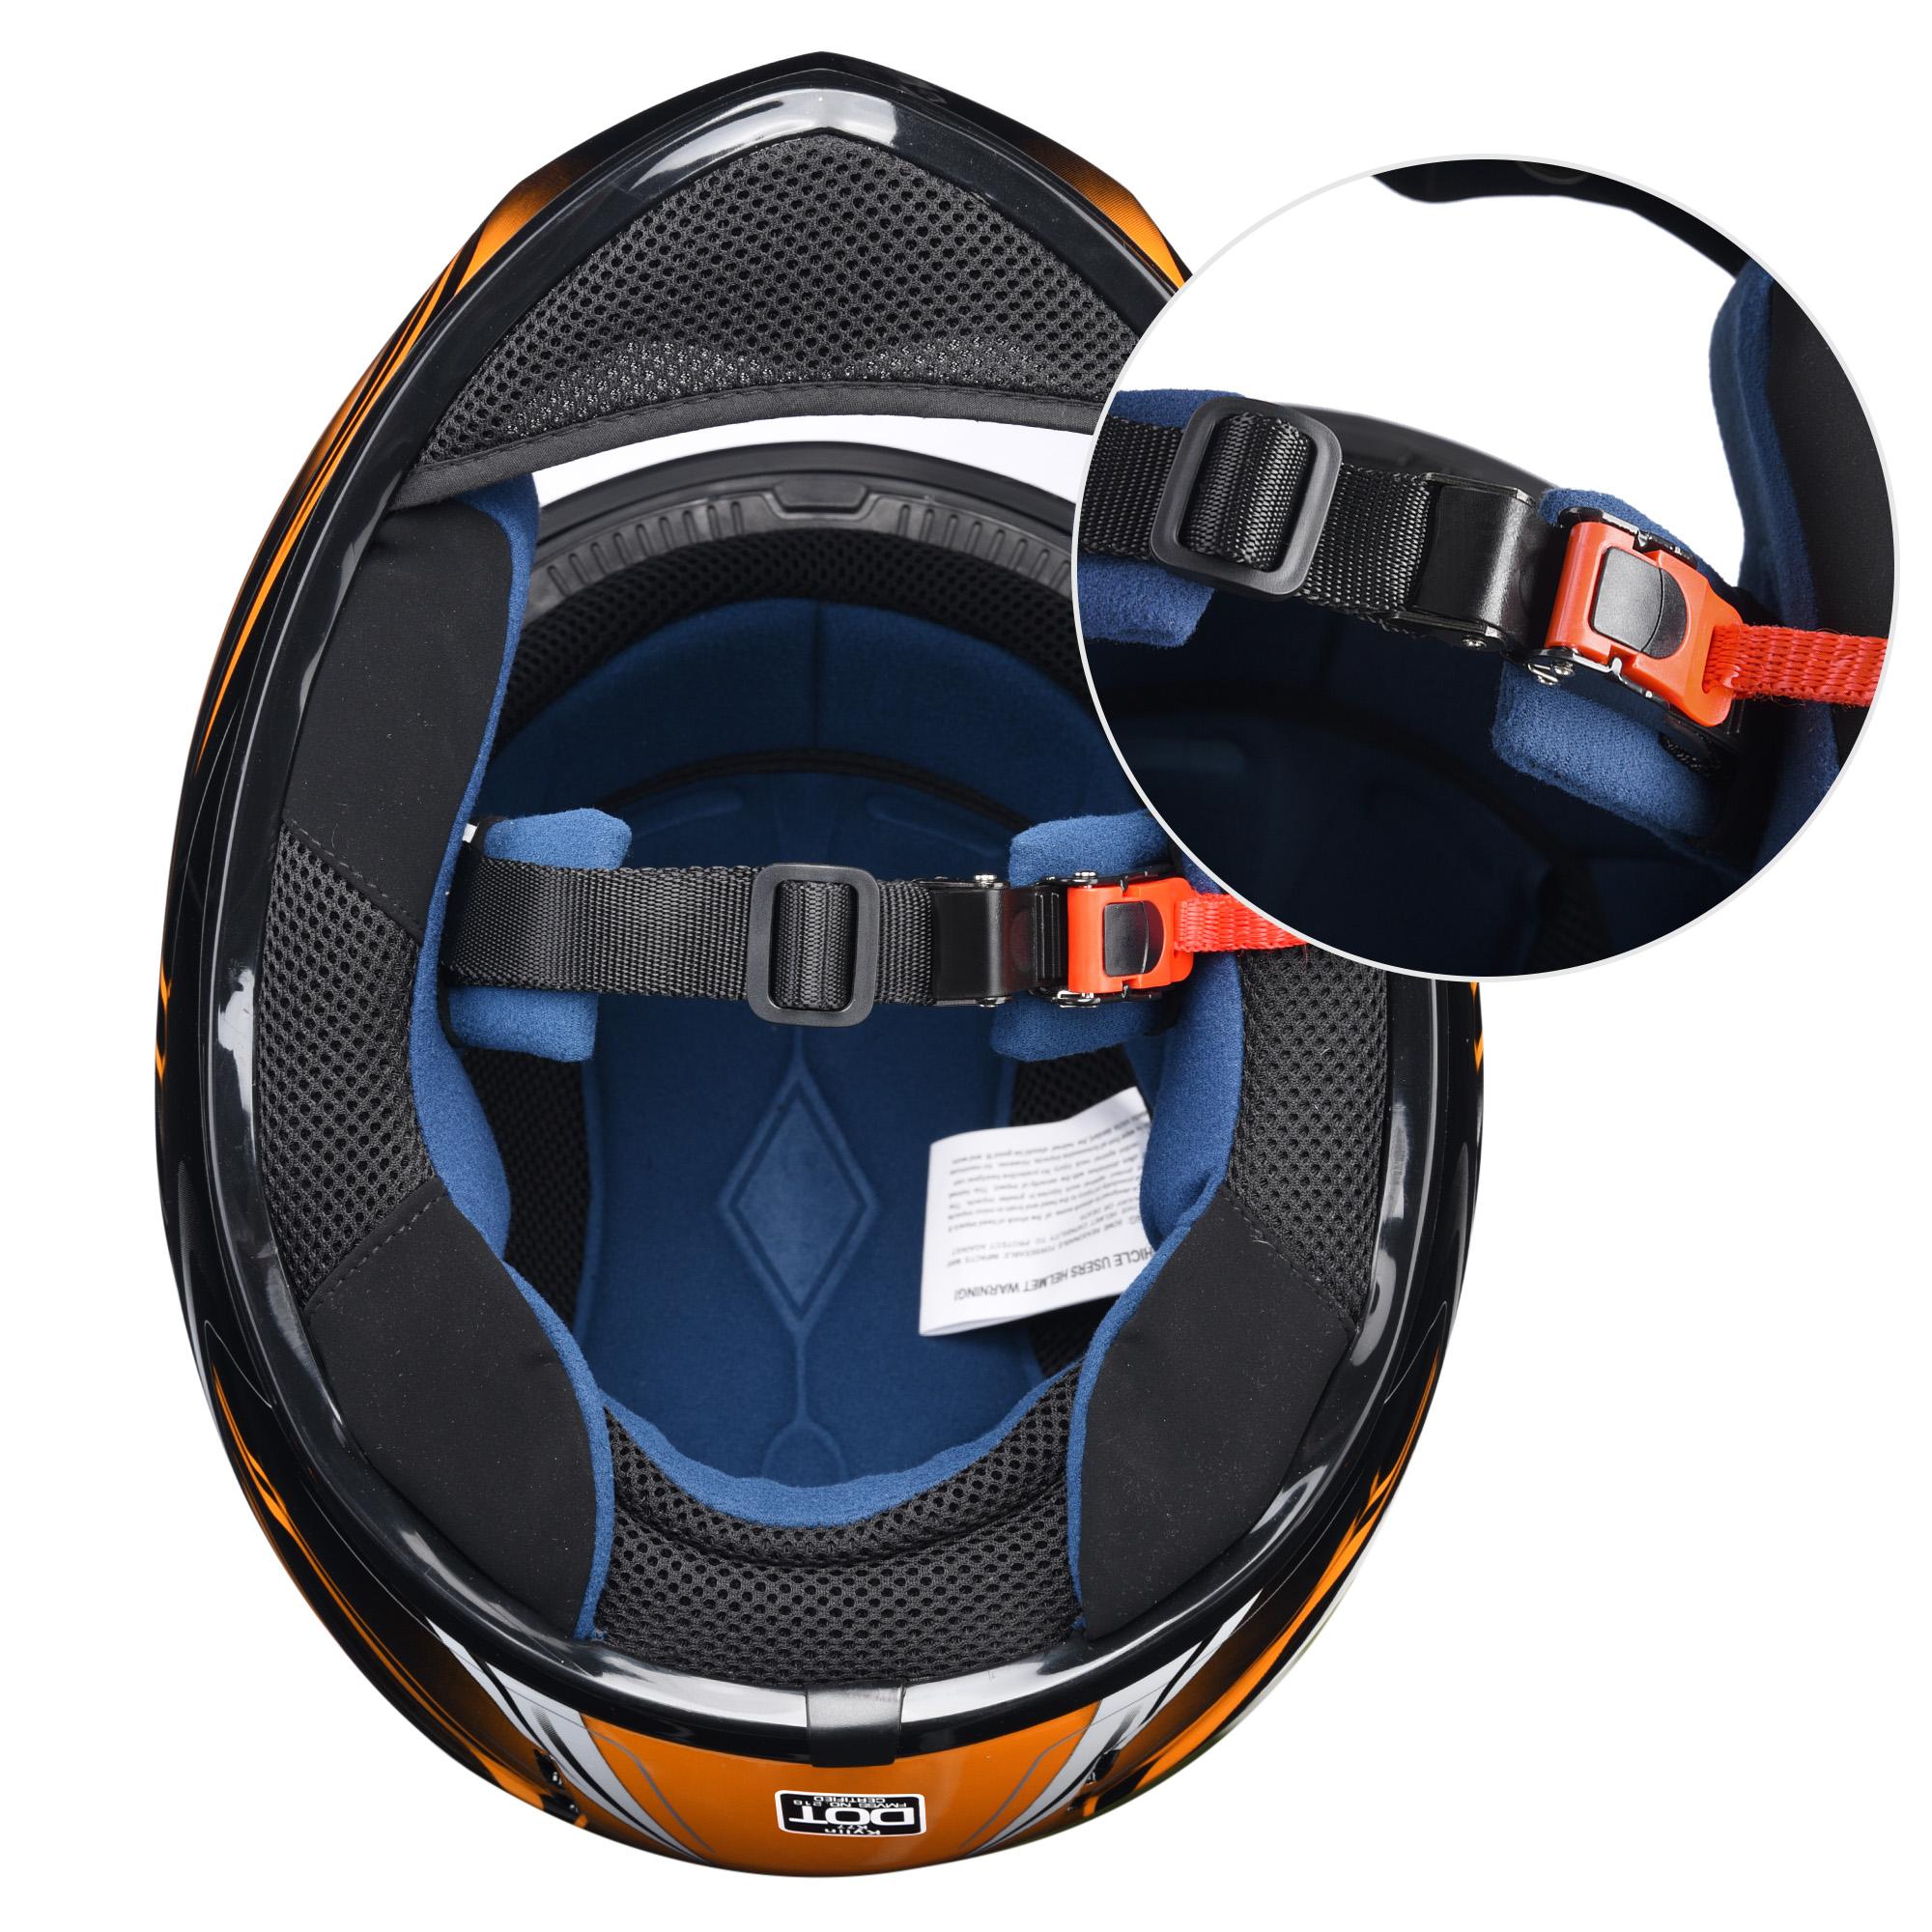 miniature 116 - AHR K12 Full Face Motorcycle Helmet DOT Air Vents Clear Visor Racing S M L XL